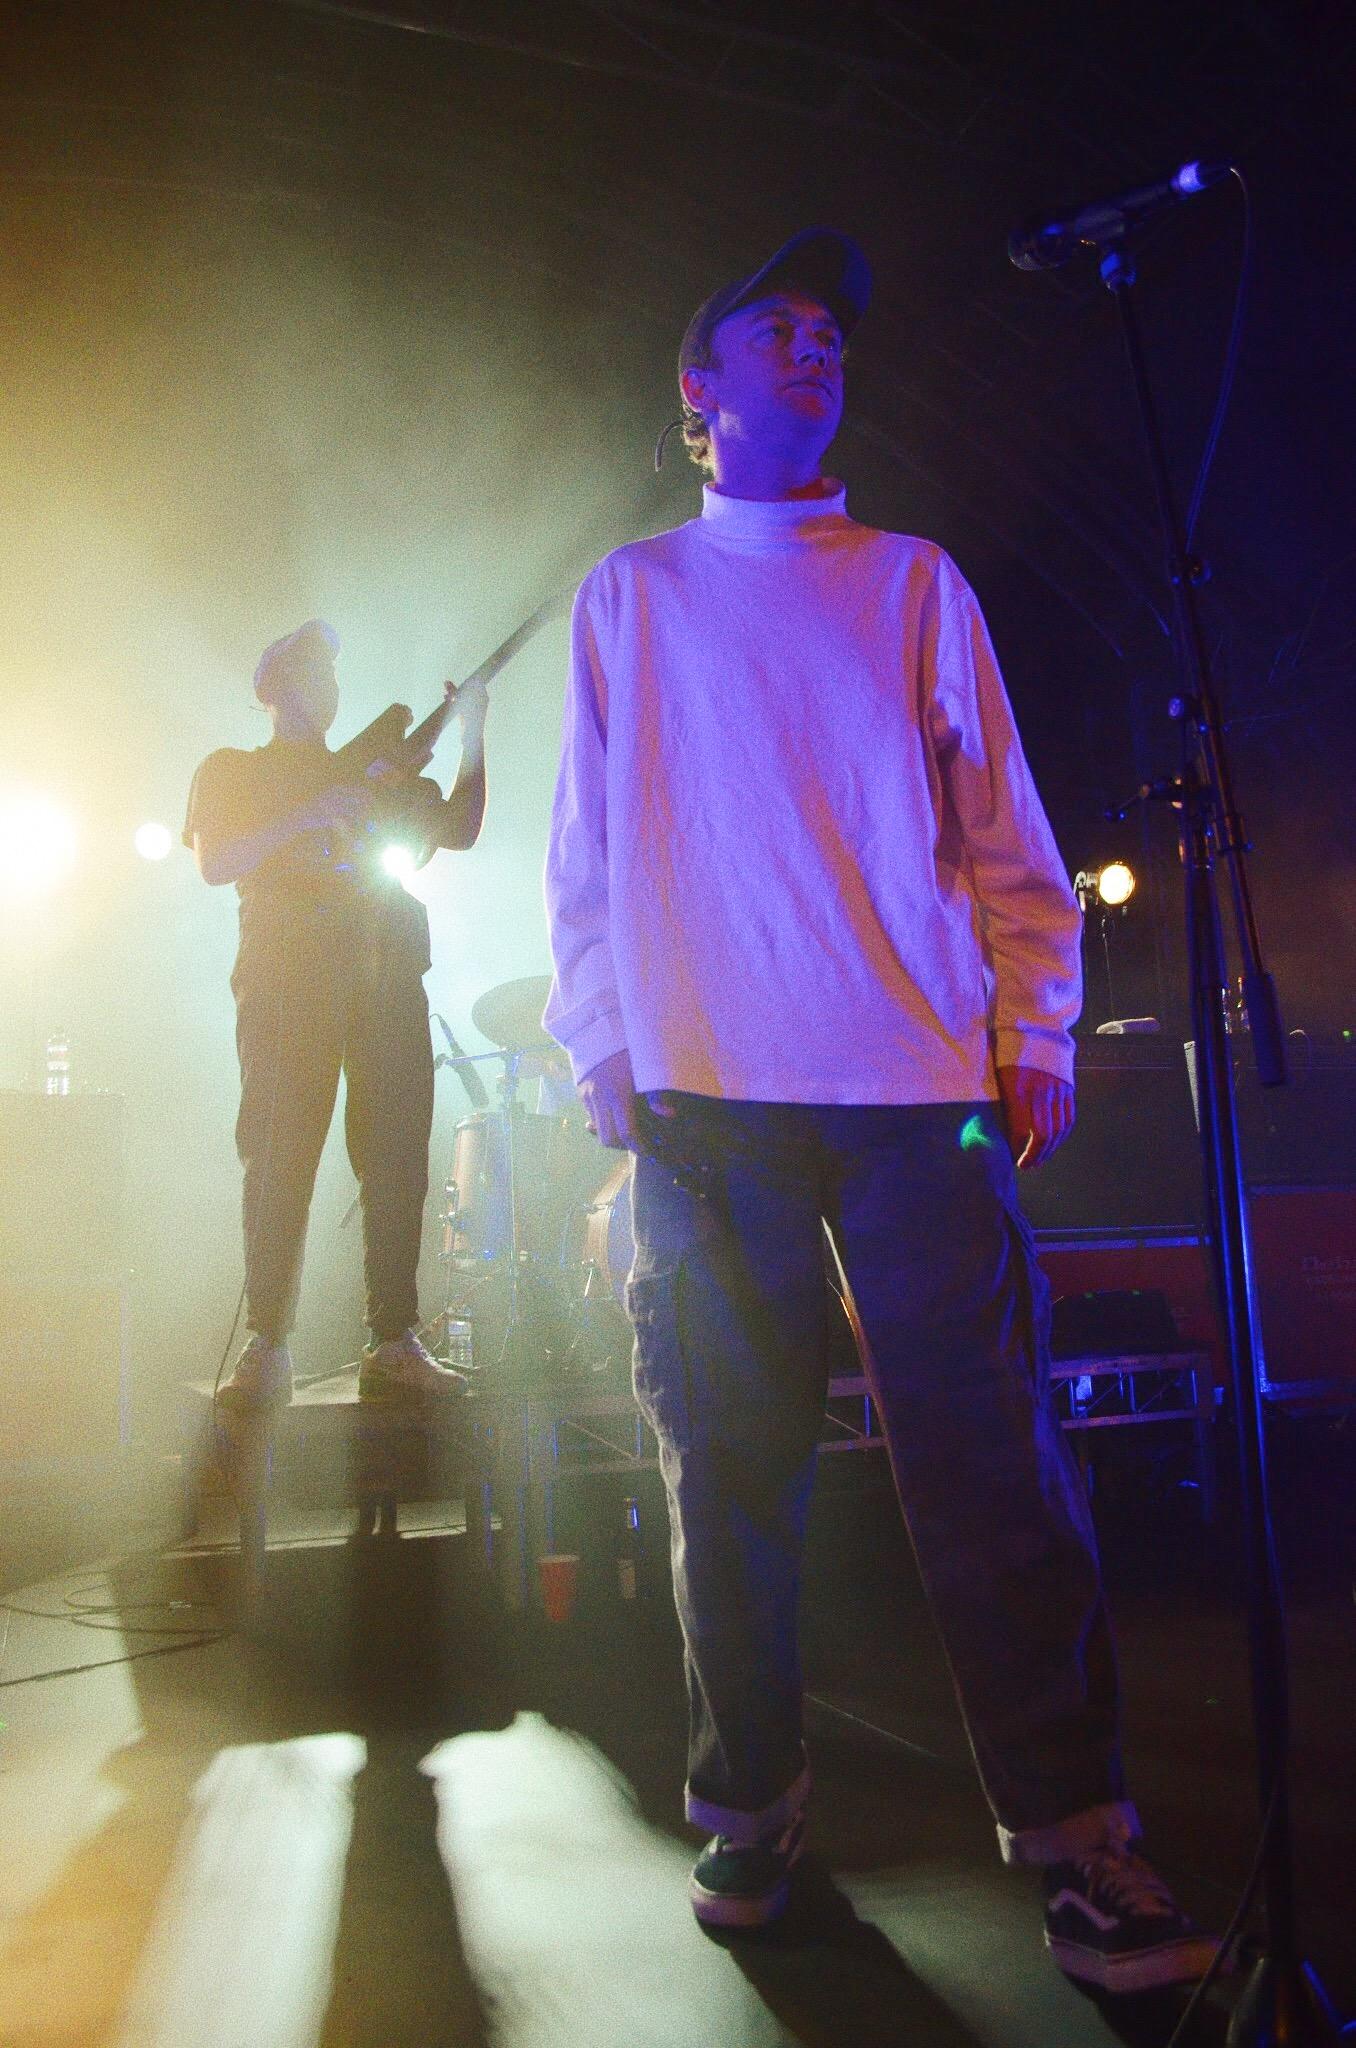 dmas music live review melbourne photo credit ryley clarke savage thrills savagethrills 11